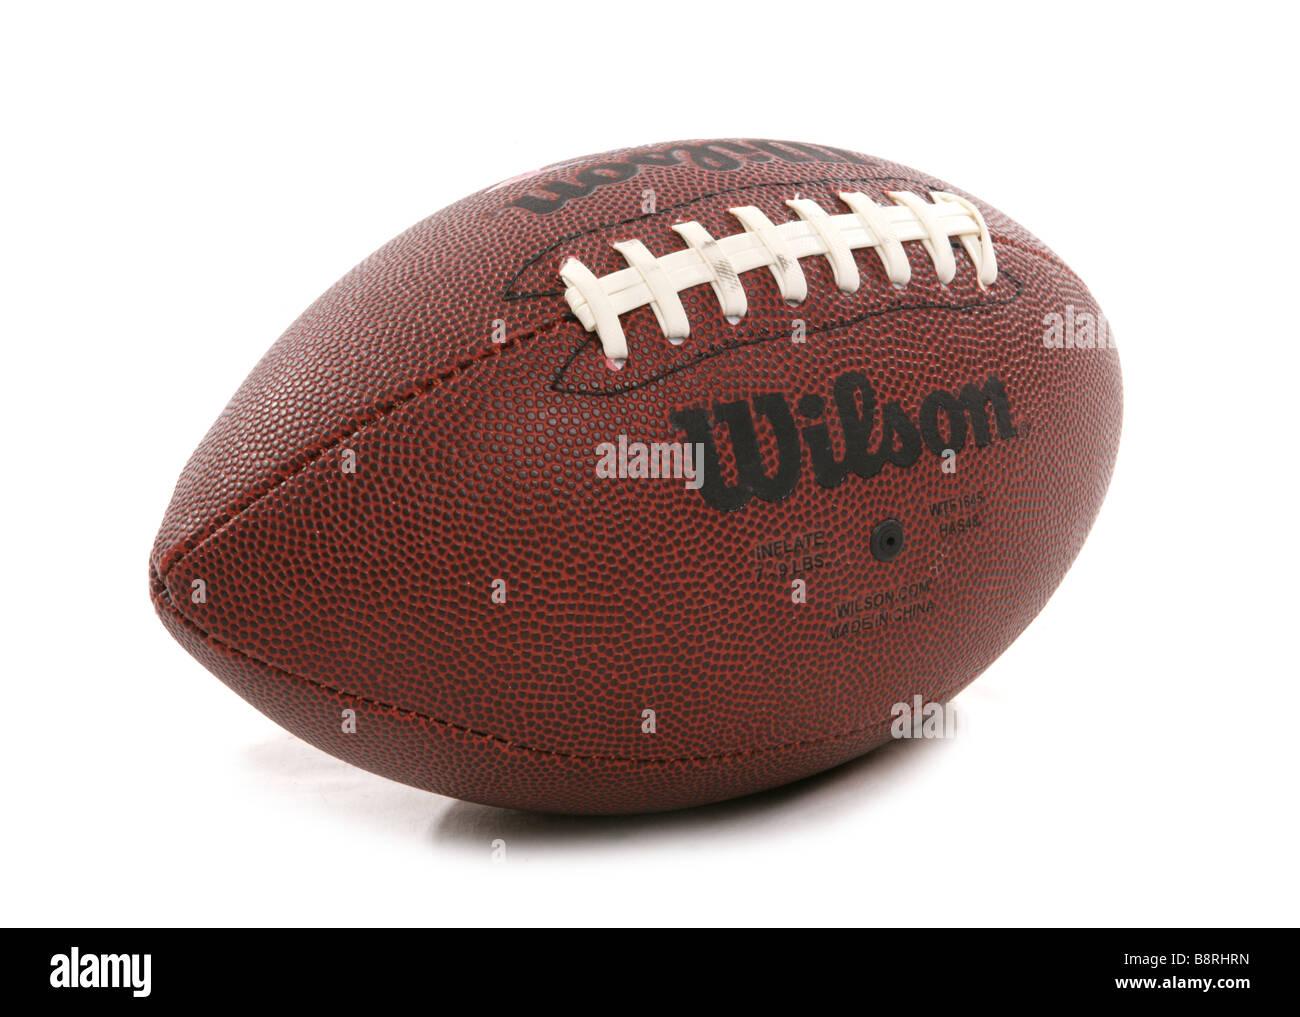 american football cutout - Stock Image